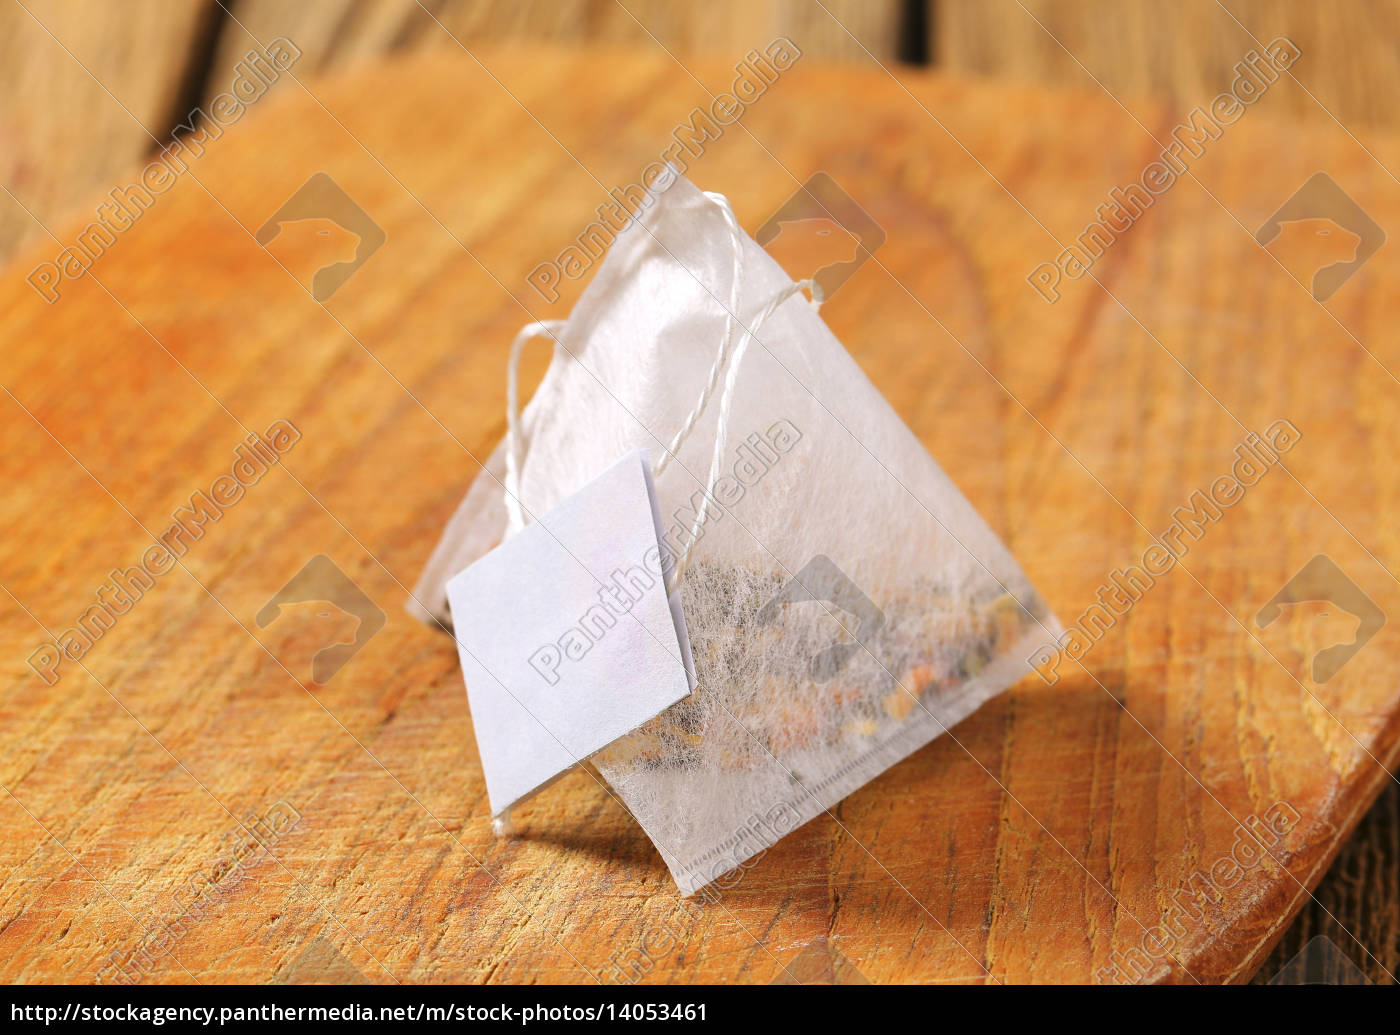 pyramid, tea, bag - 14053461